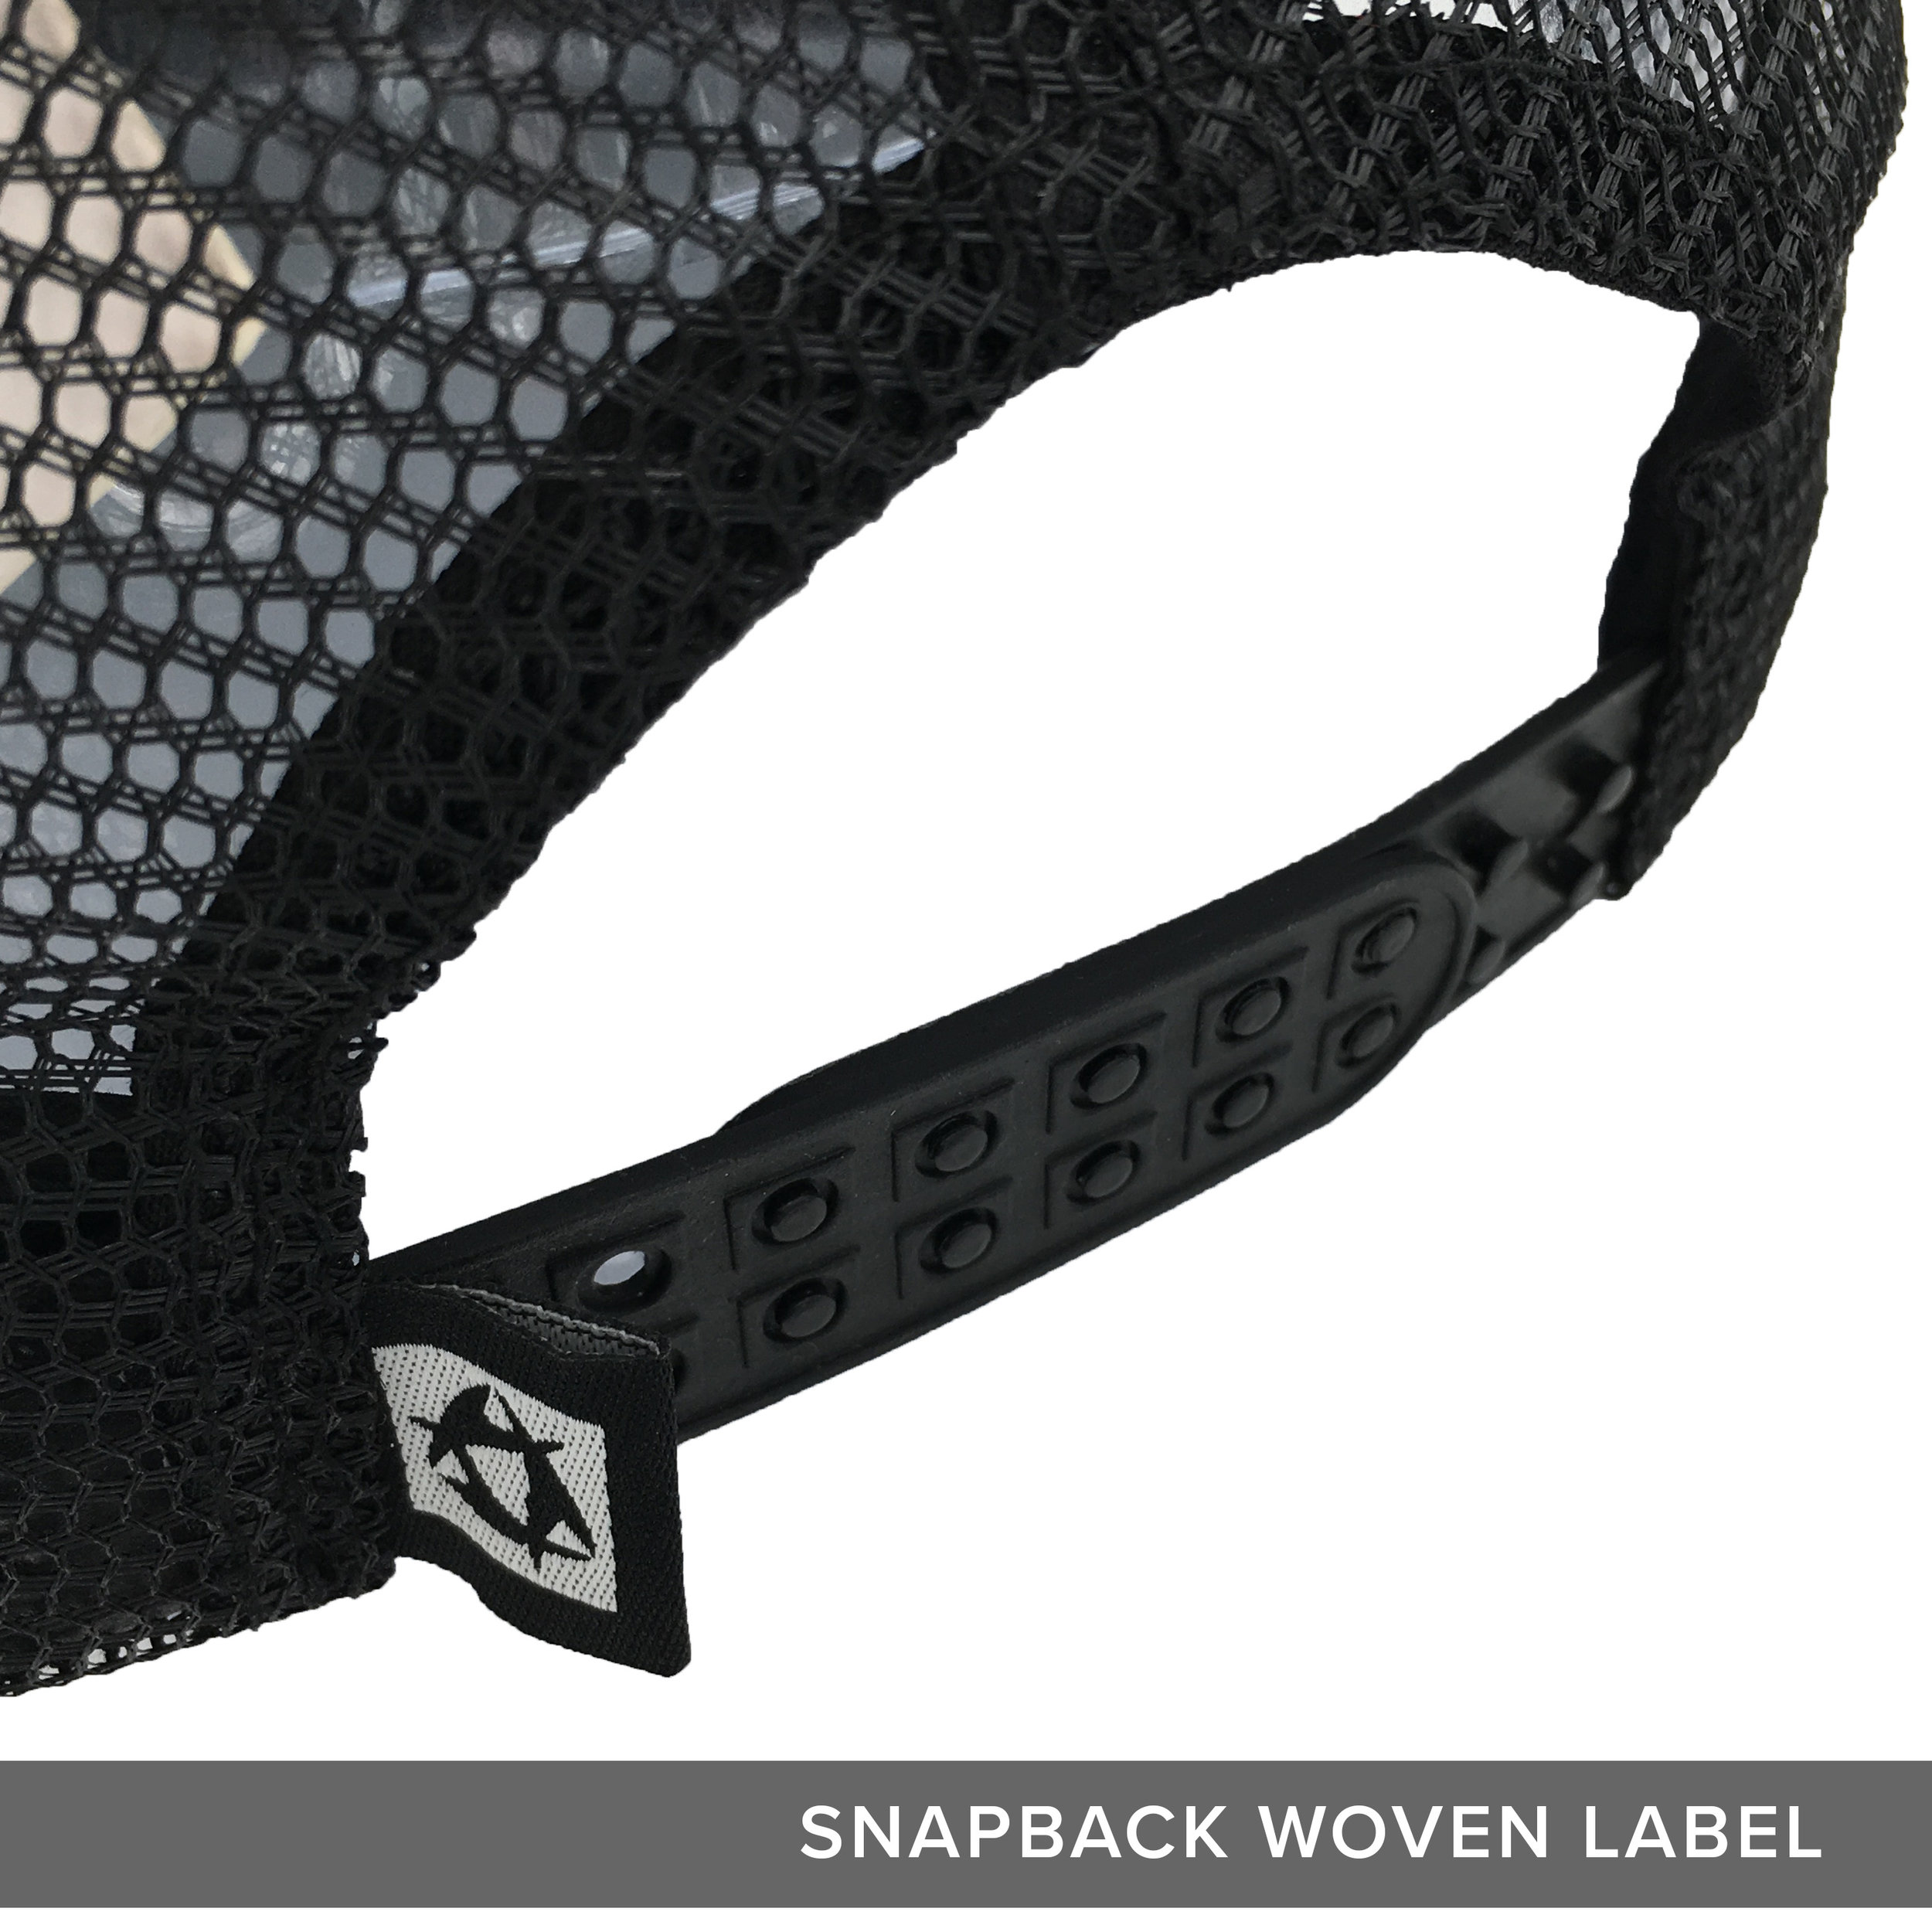 snapback_woven_label.jpg